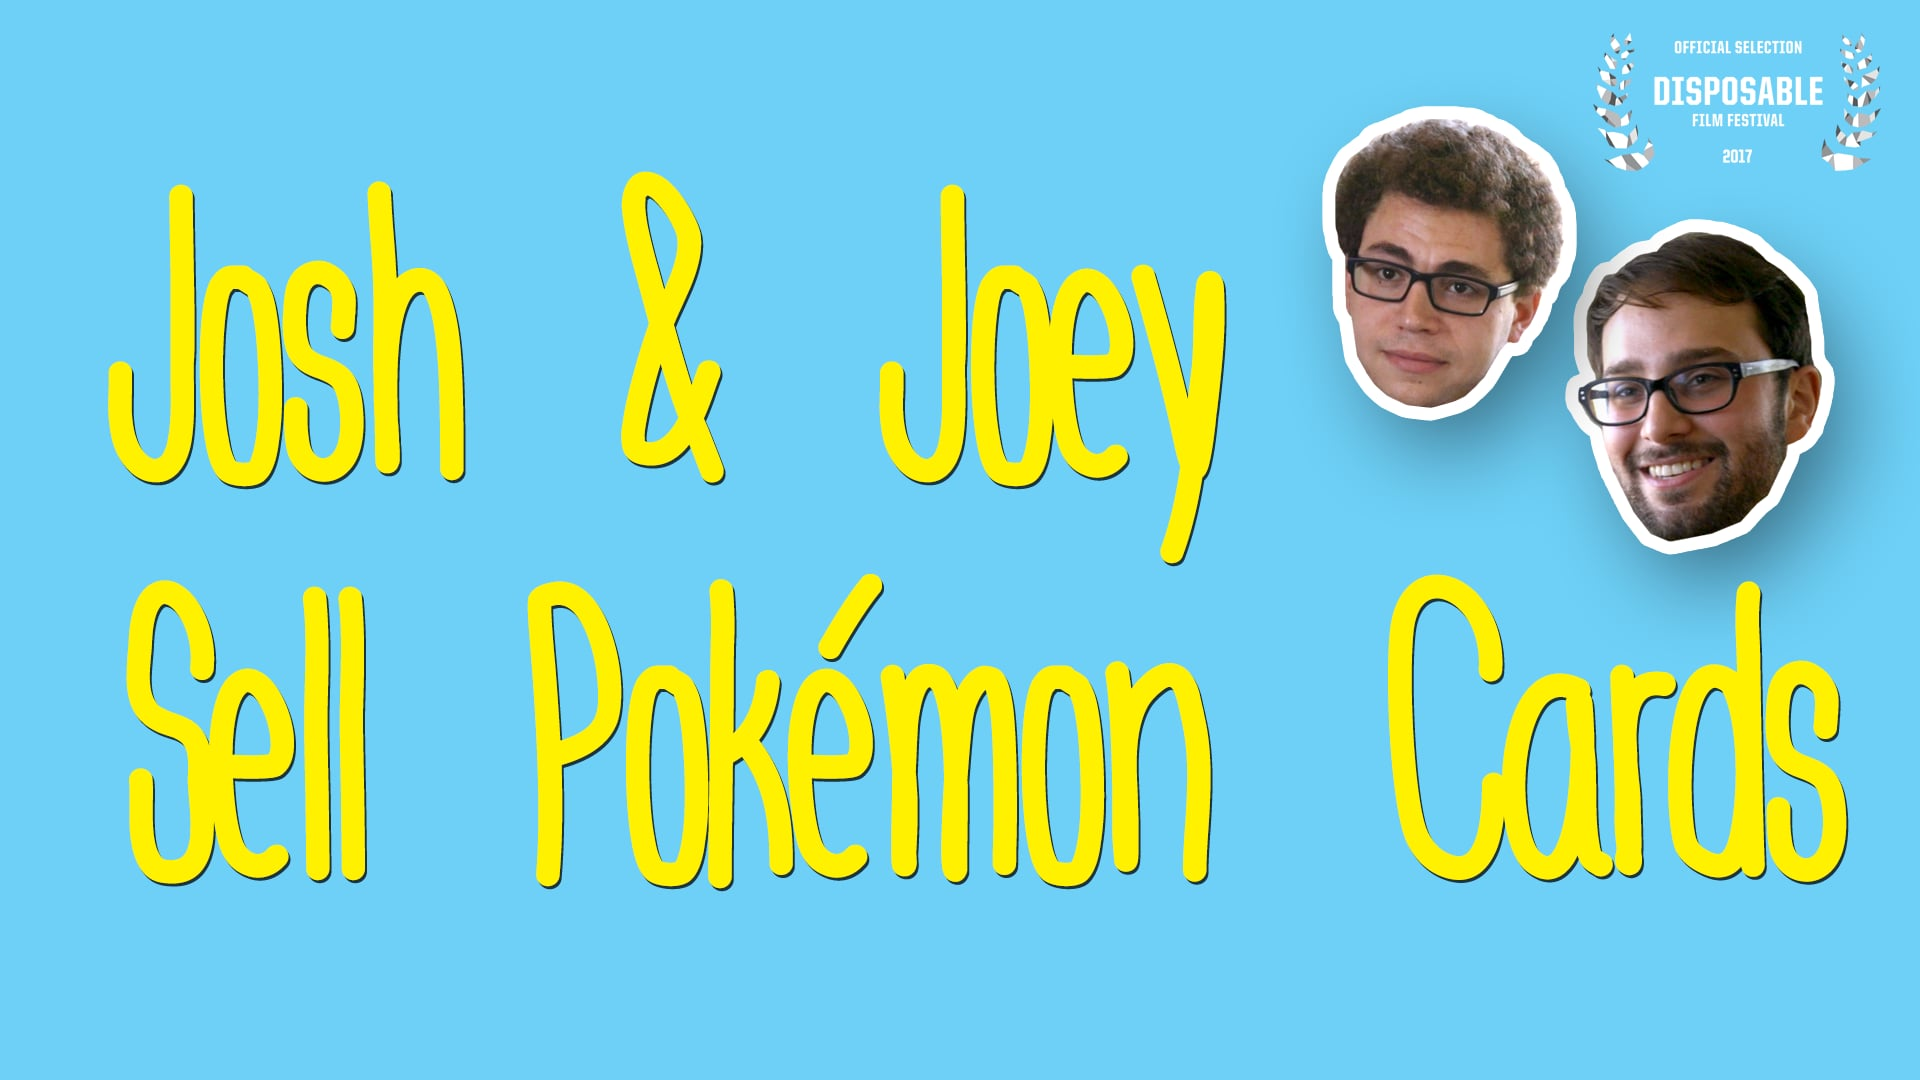 Josh & Joey Sell Pokémon Cards